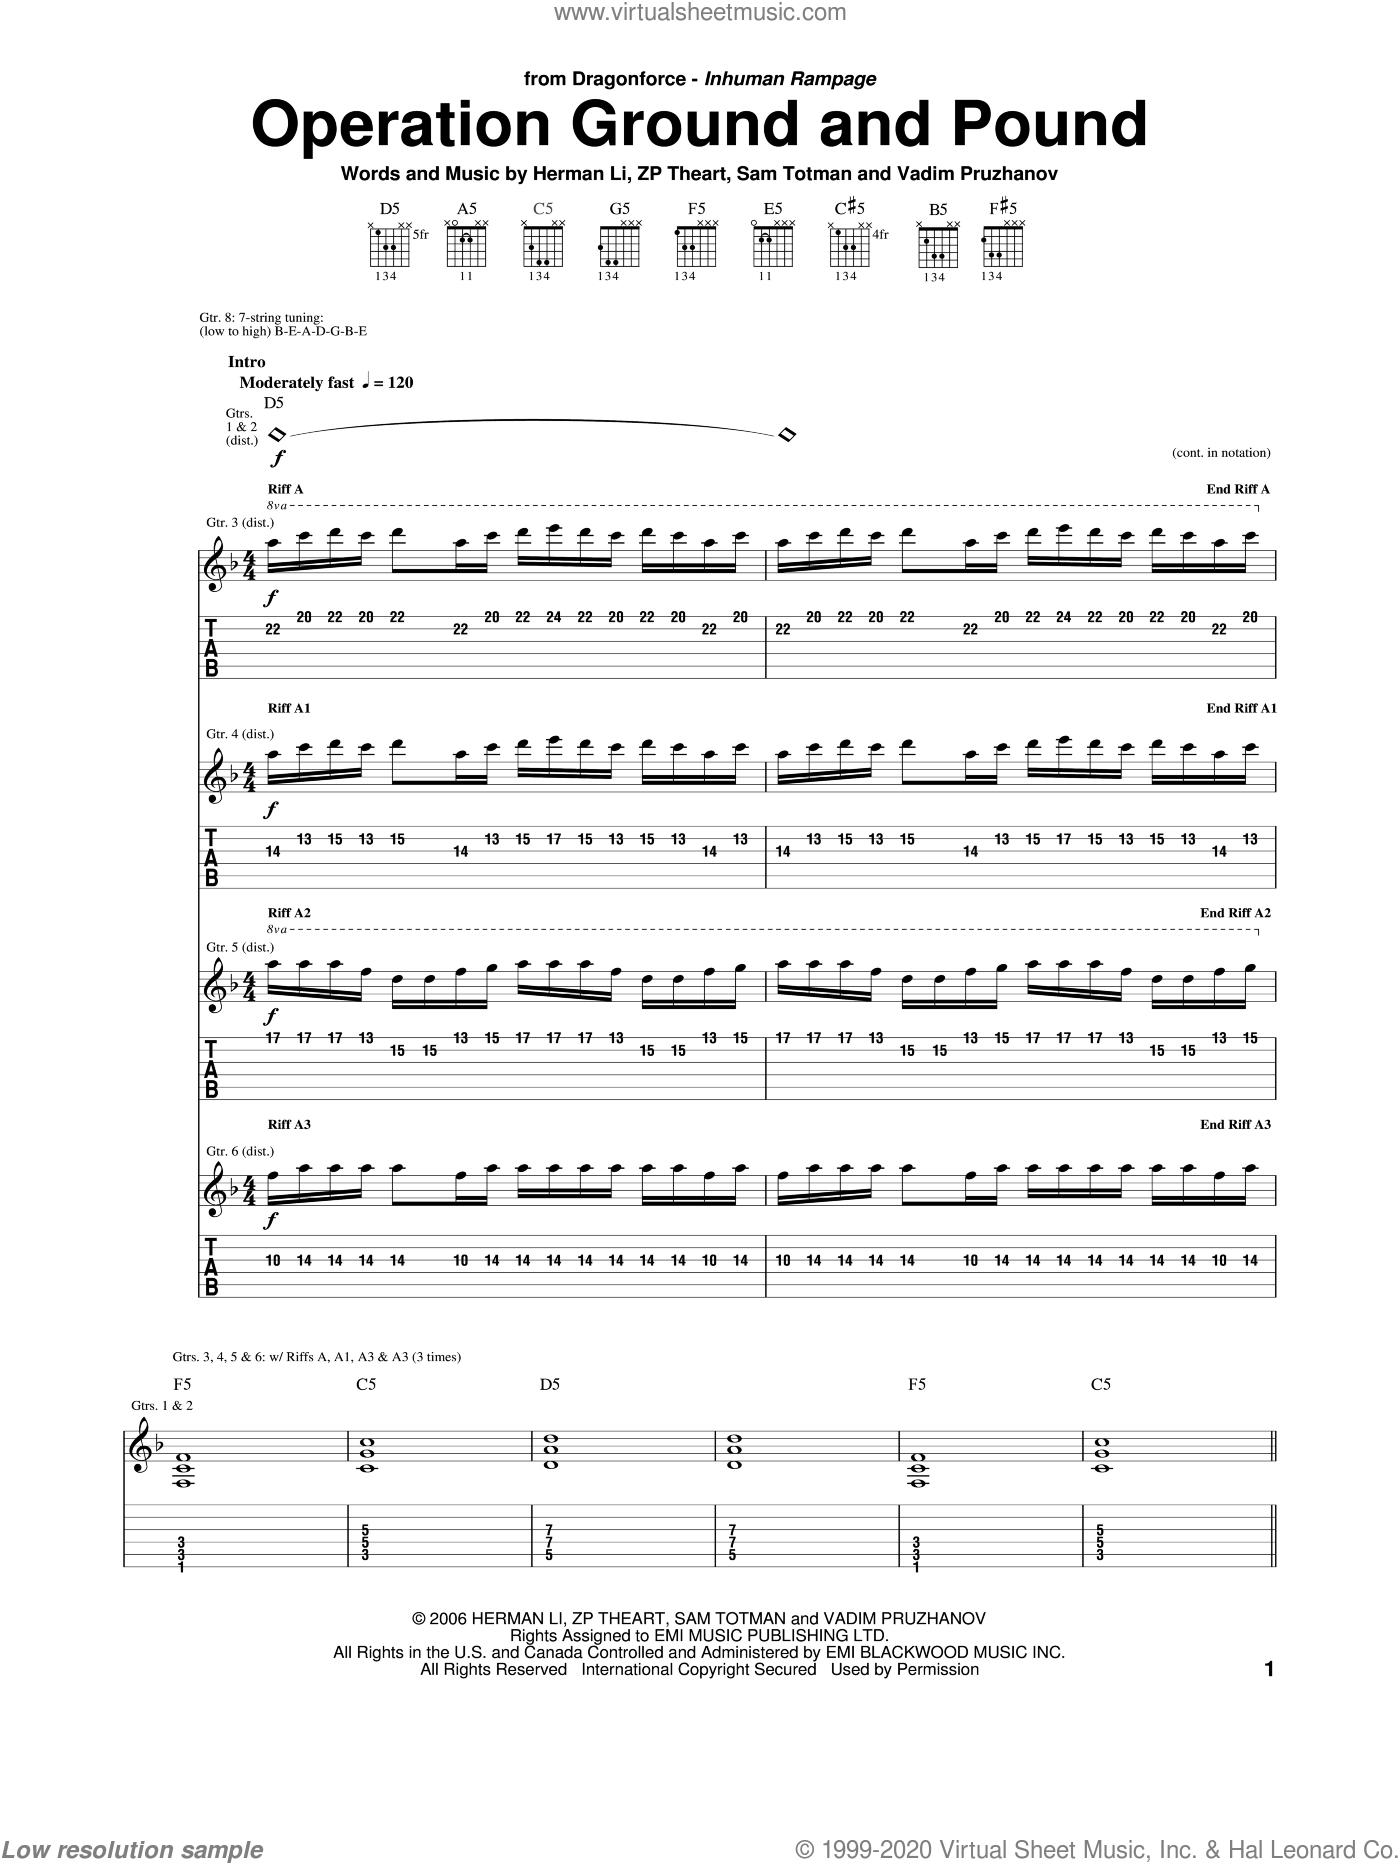 Operation Ground And Pound sheet music for guitar (tablature) by Dragonforce, Herman Li, Sam Totman, Vadim Pruzhanov and ZP Theart, intermediate skill level